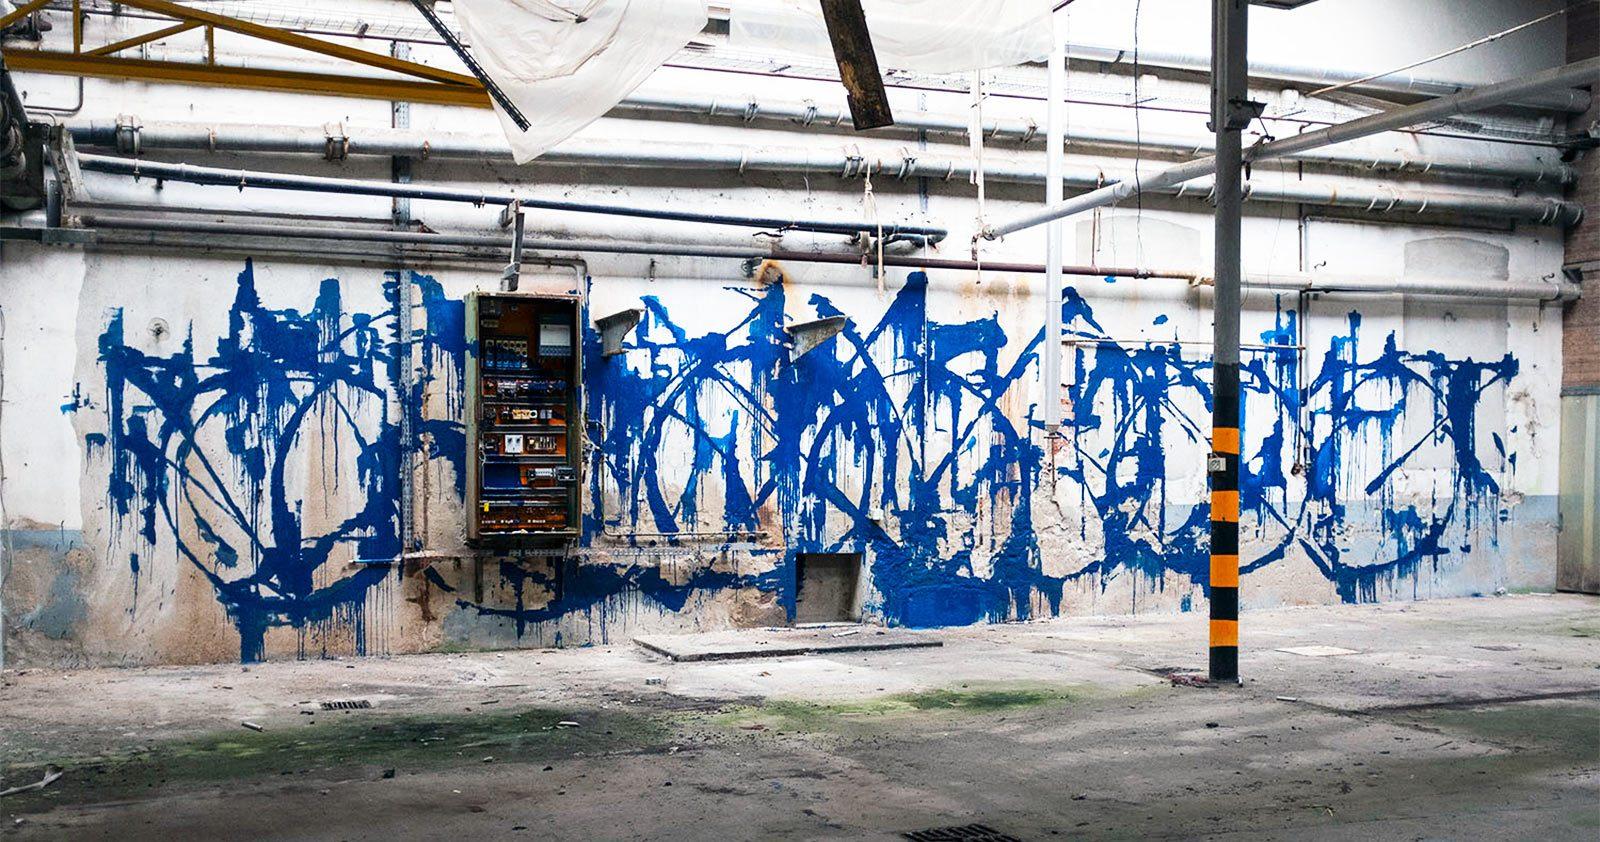 Soemone, Graffiti abstrait et calligraphie